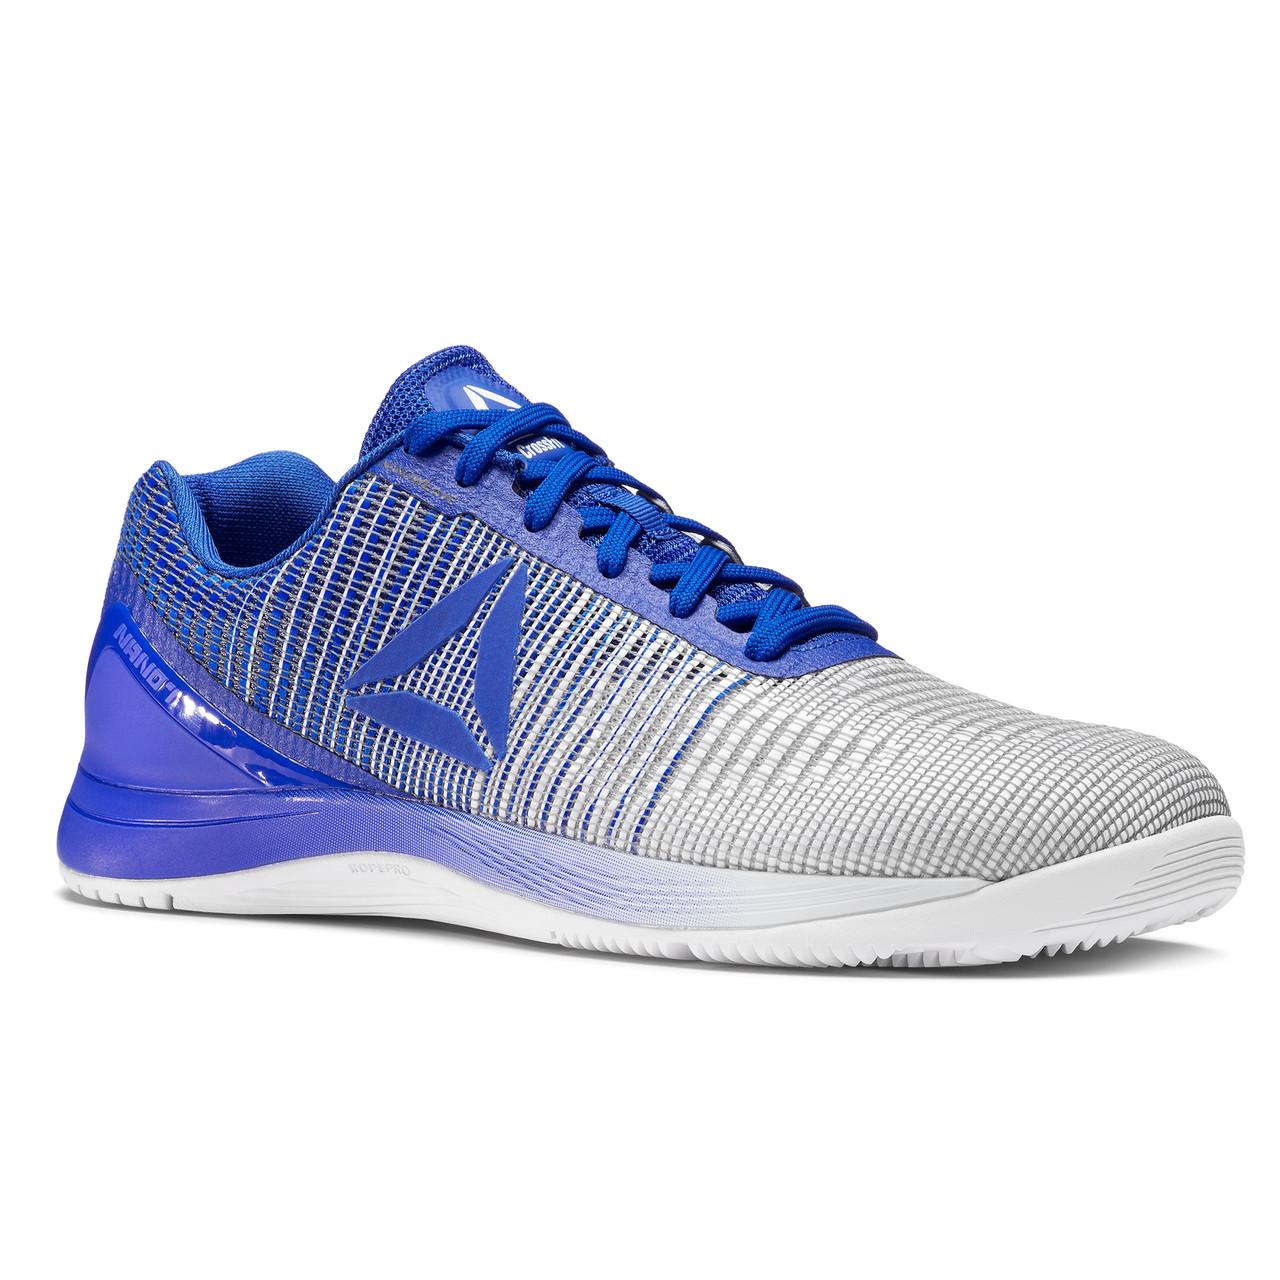 f8f4eff08b1d Обувь для кроссфита REEBOK CrossFit Nano 7 BS8347 - Popsport.com.ua ‒  интернет